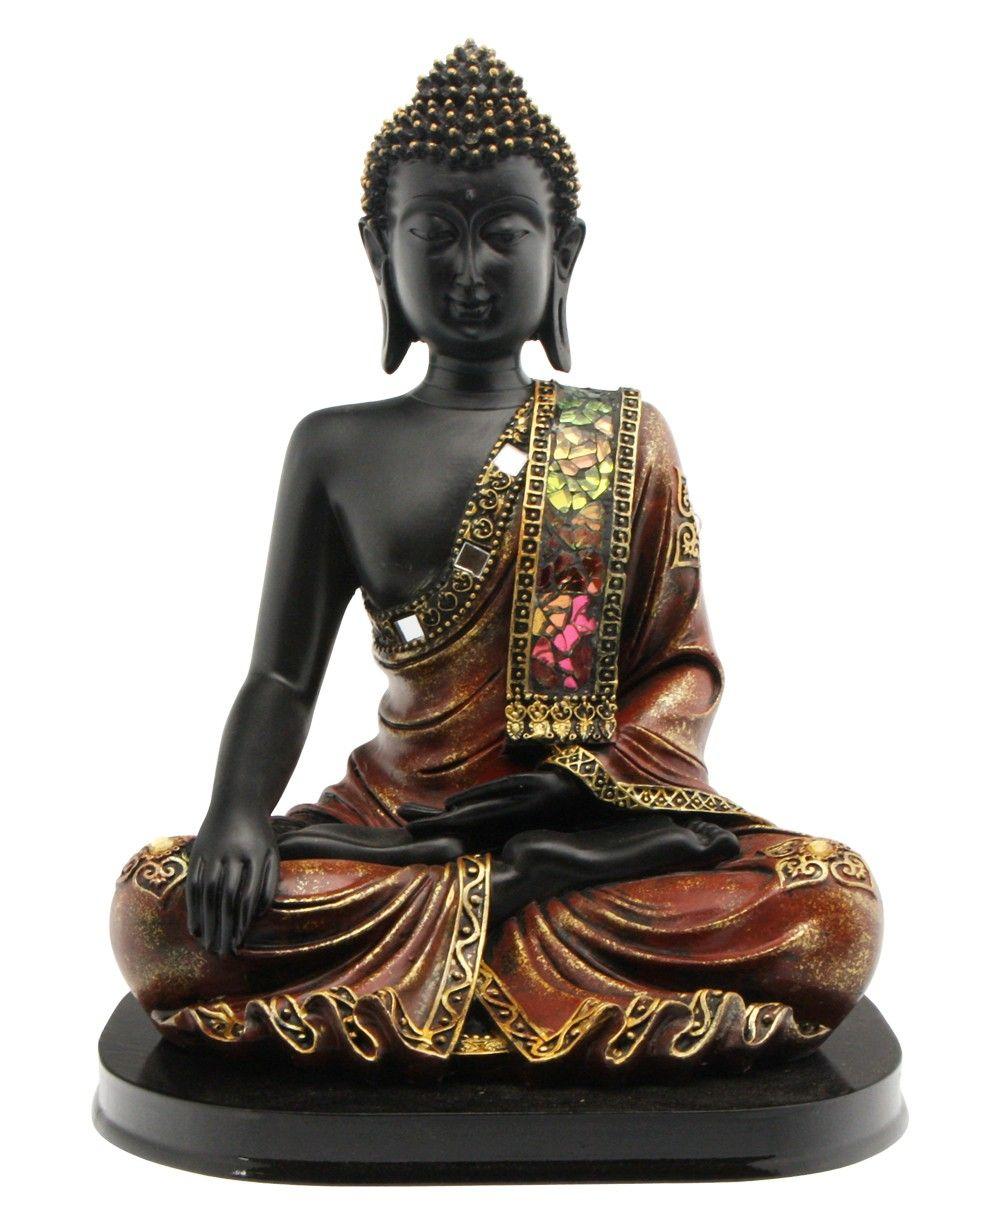 Black Buddha Statue with Mosaic Design on a Base - Buddha Statues